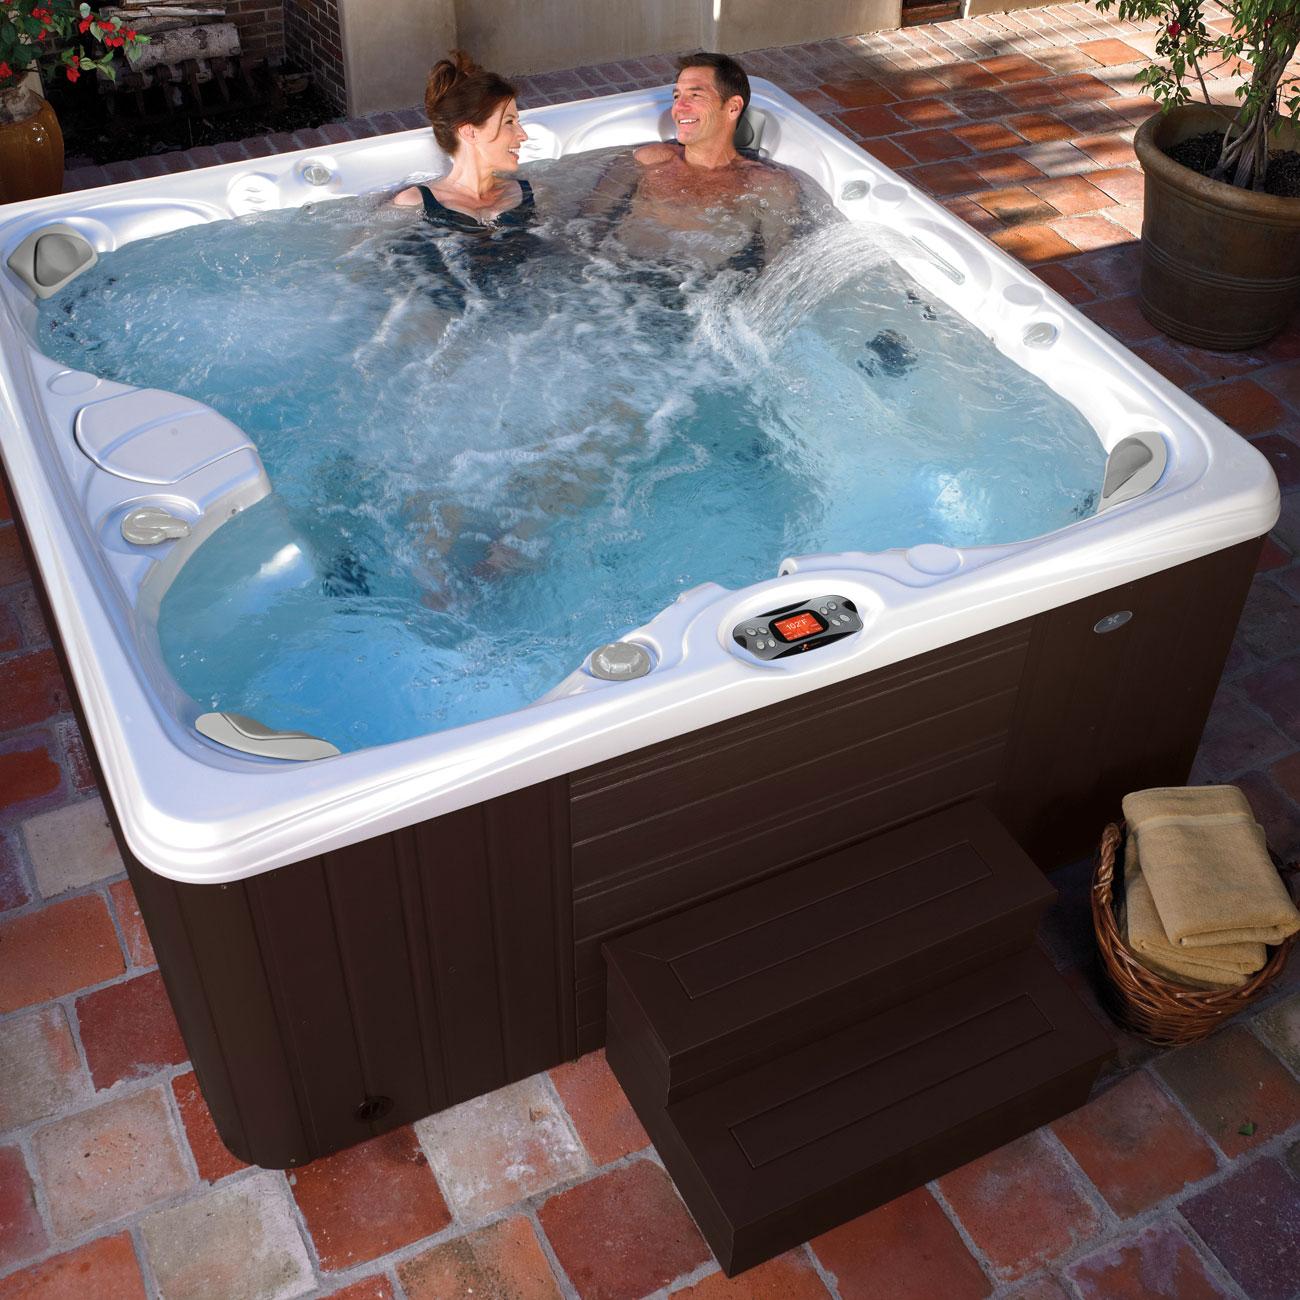 Caldera Spa Salina 7 Person Luxury Outdoor Living